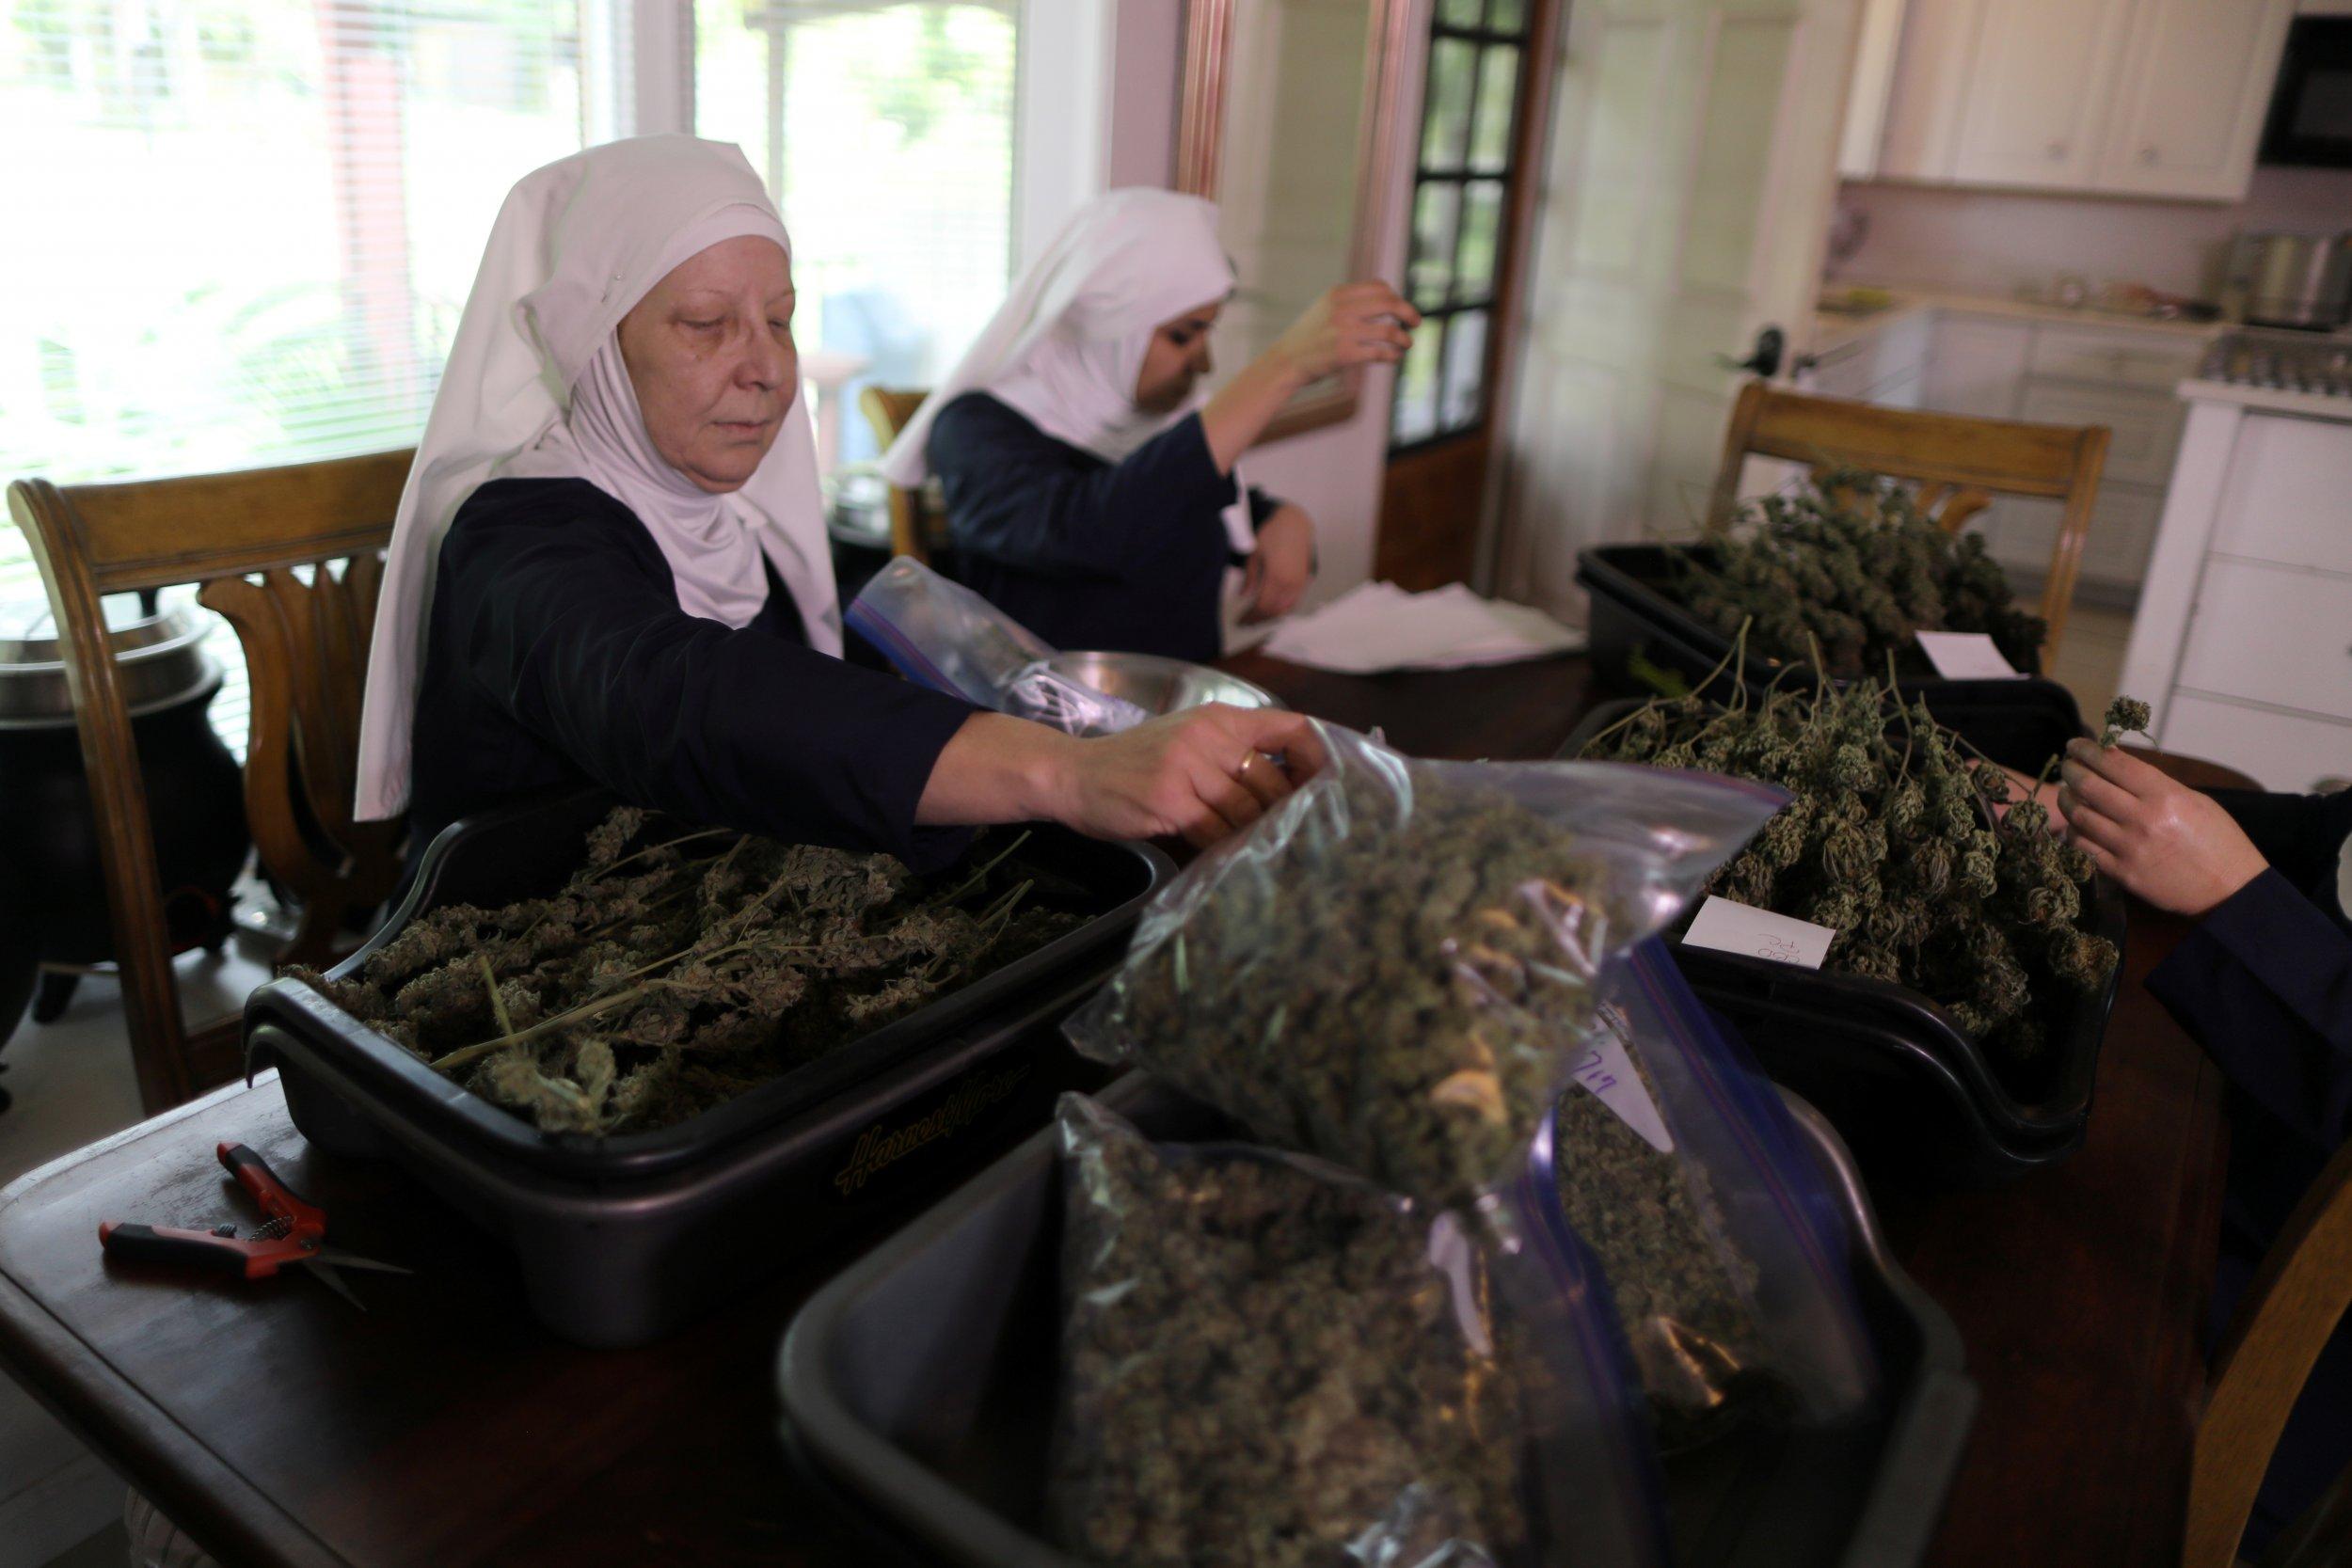 11_21_Church_Nuns_Jesus_Marijuana